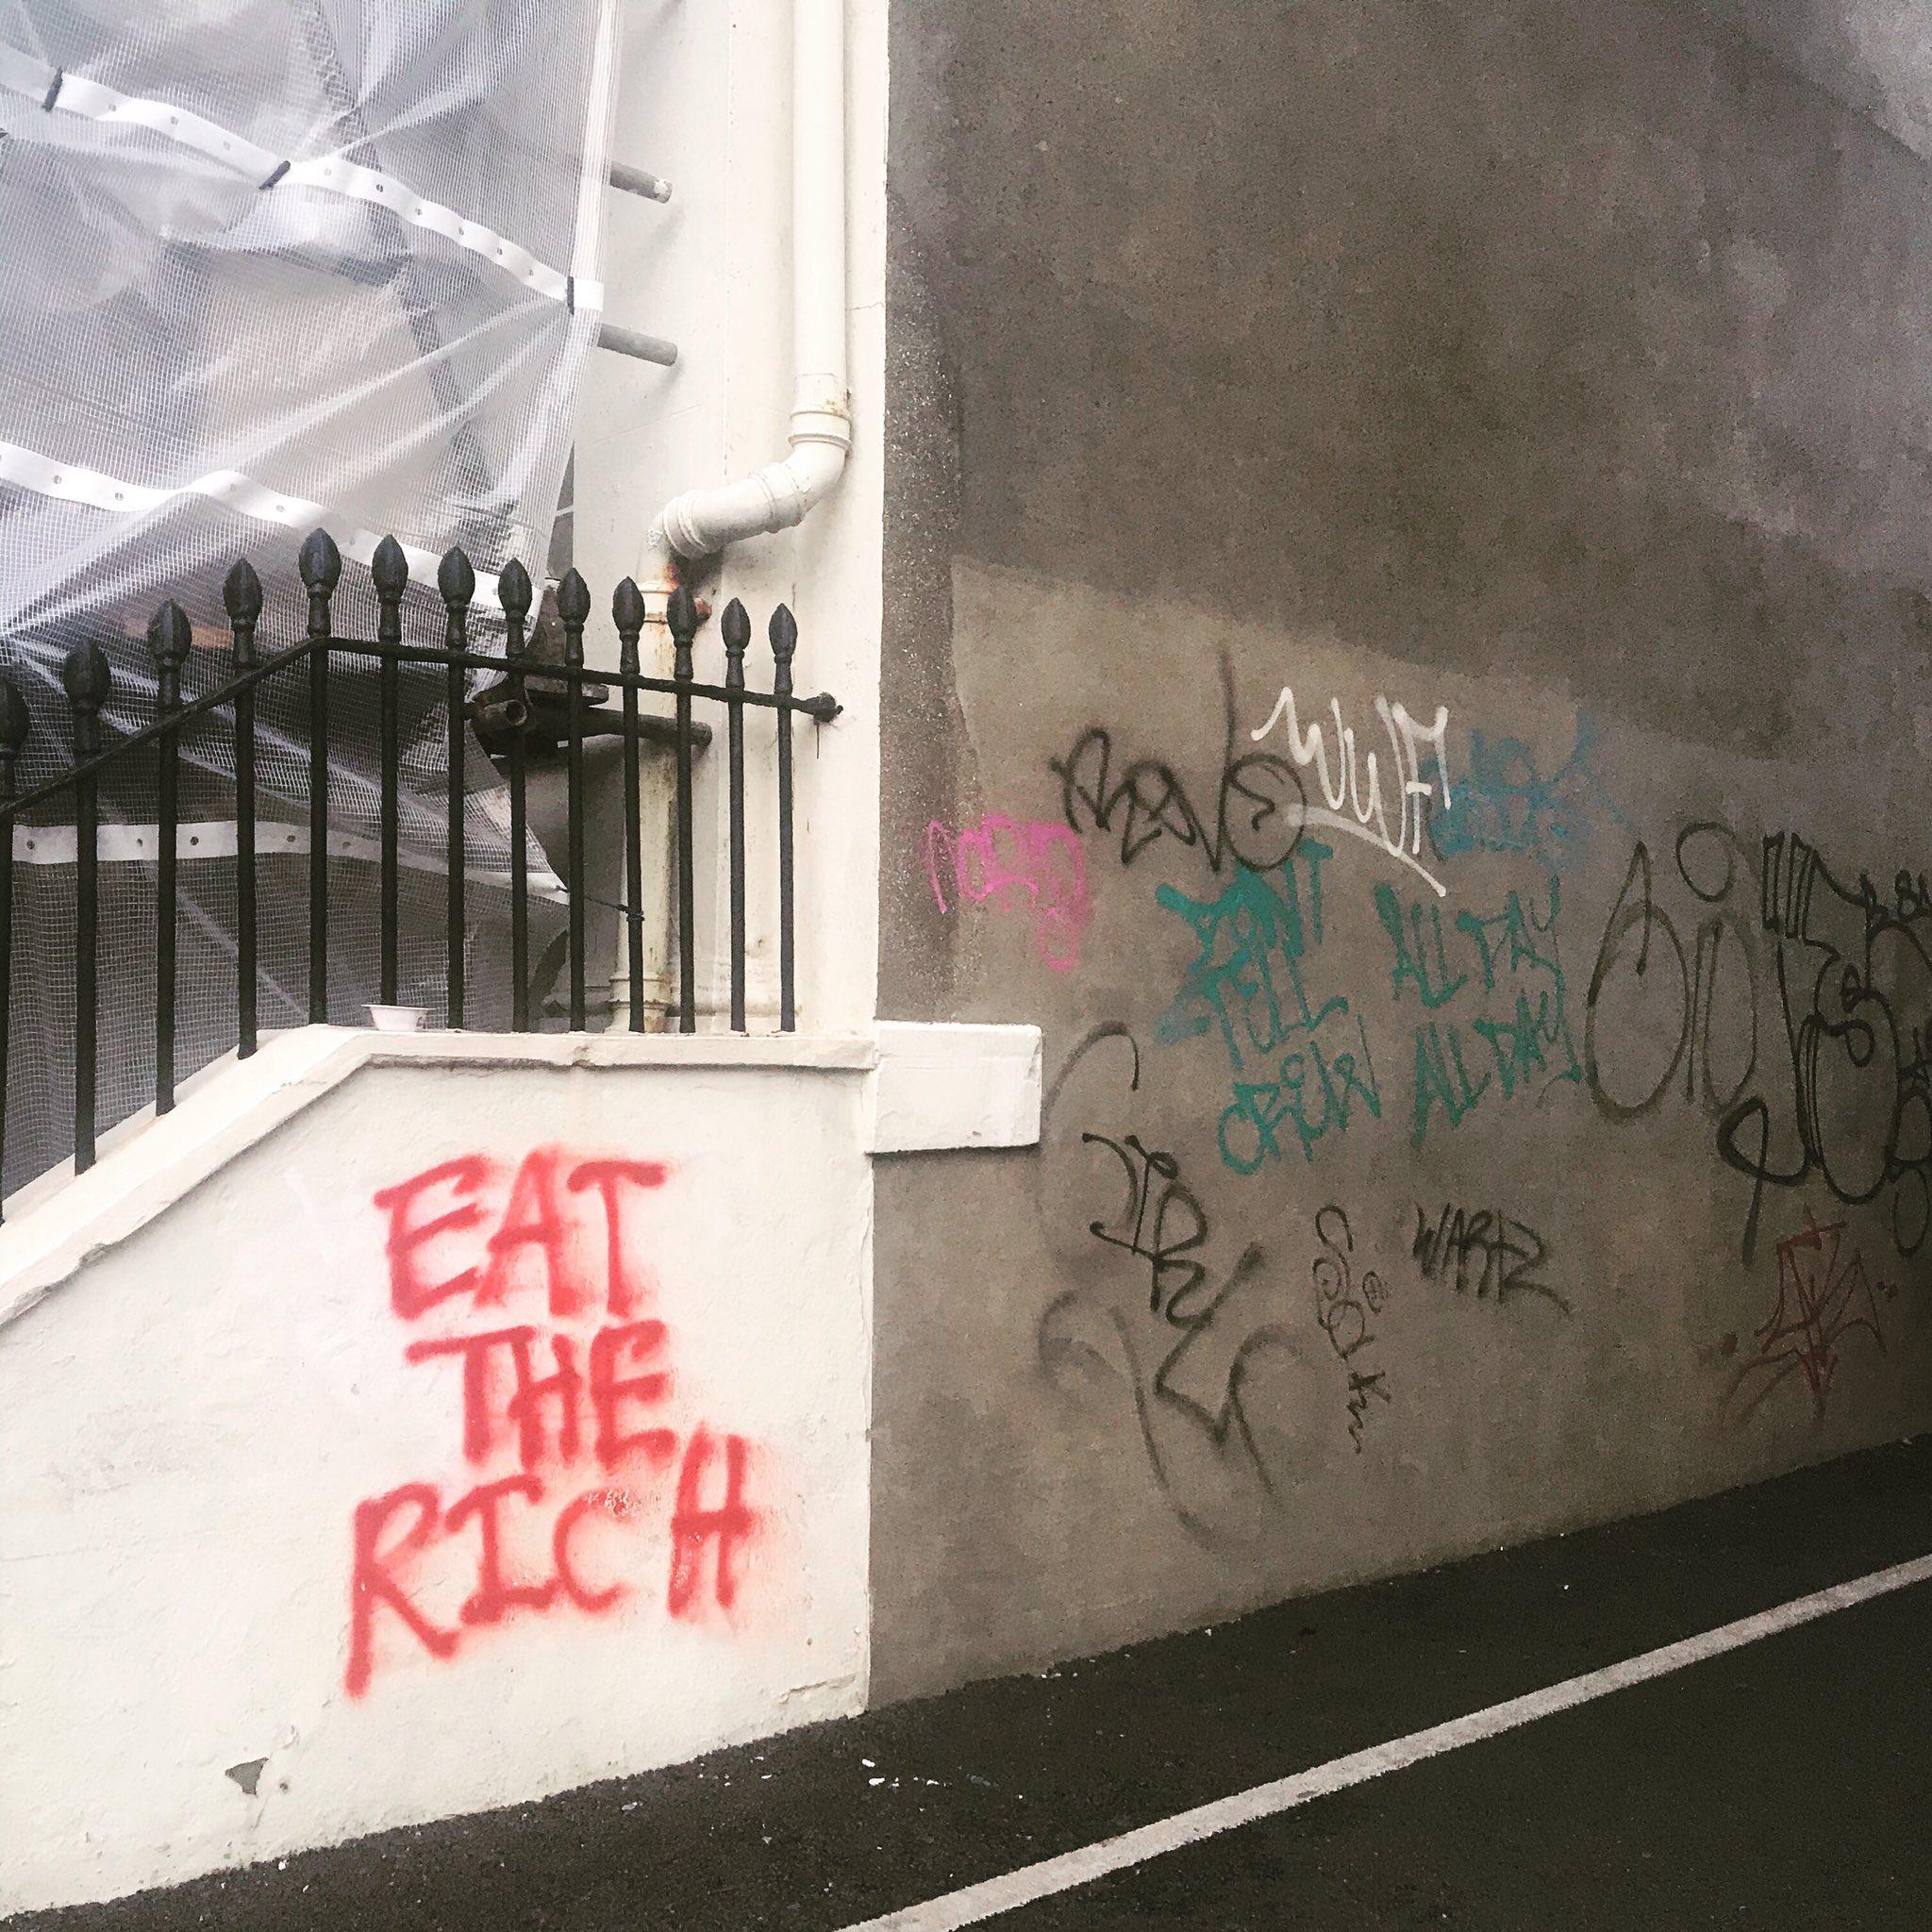 The time has come... #poverty #hunger #streetart #politicalart #streetarteverywhere #realfood #naturalhealth #novaccine #ecology #brightonartists #brightonstreetart #brightonlife https://t.co/Qglk5q9zSC